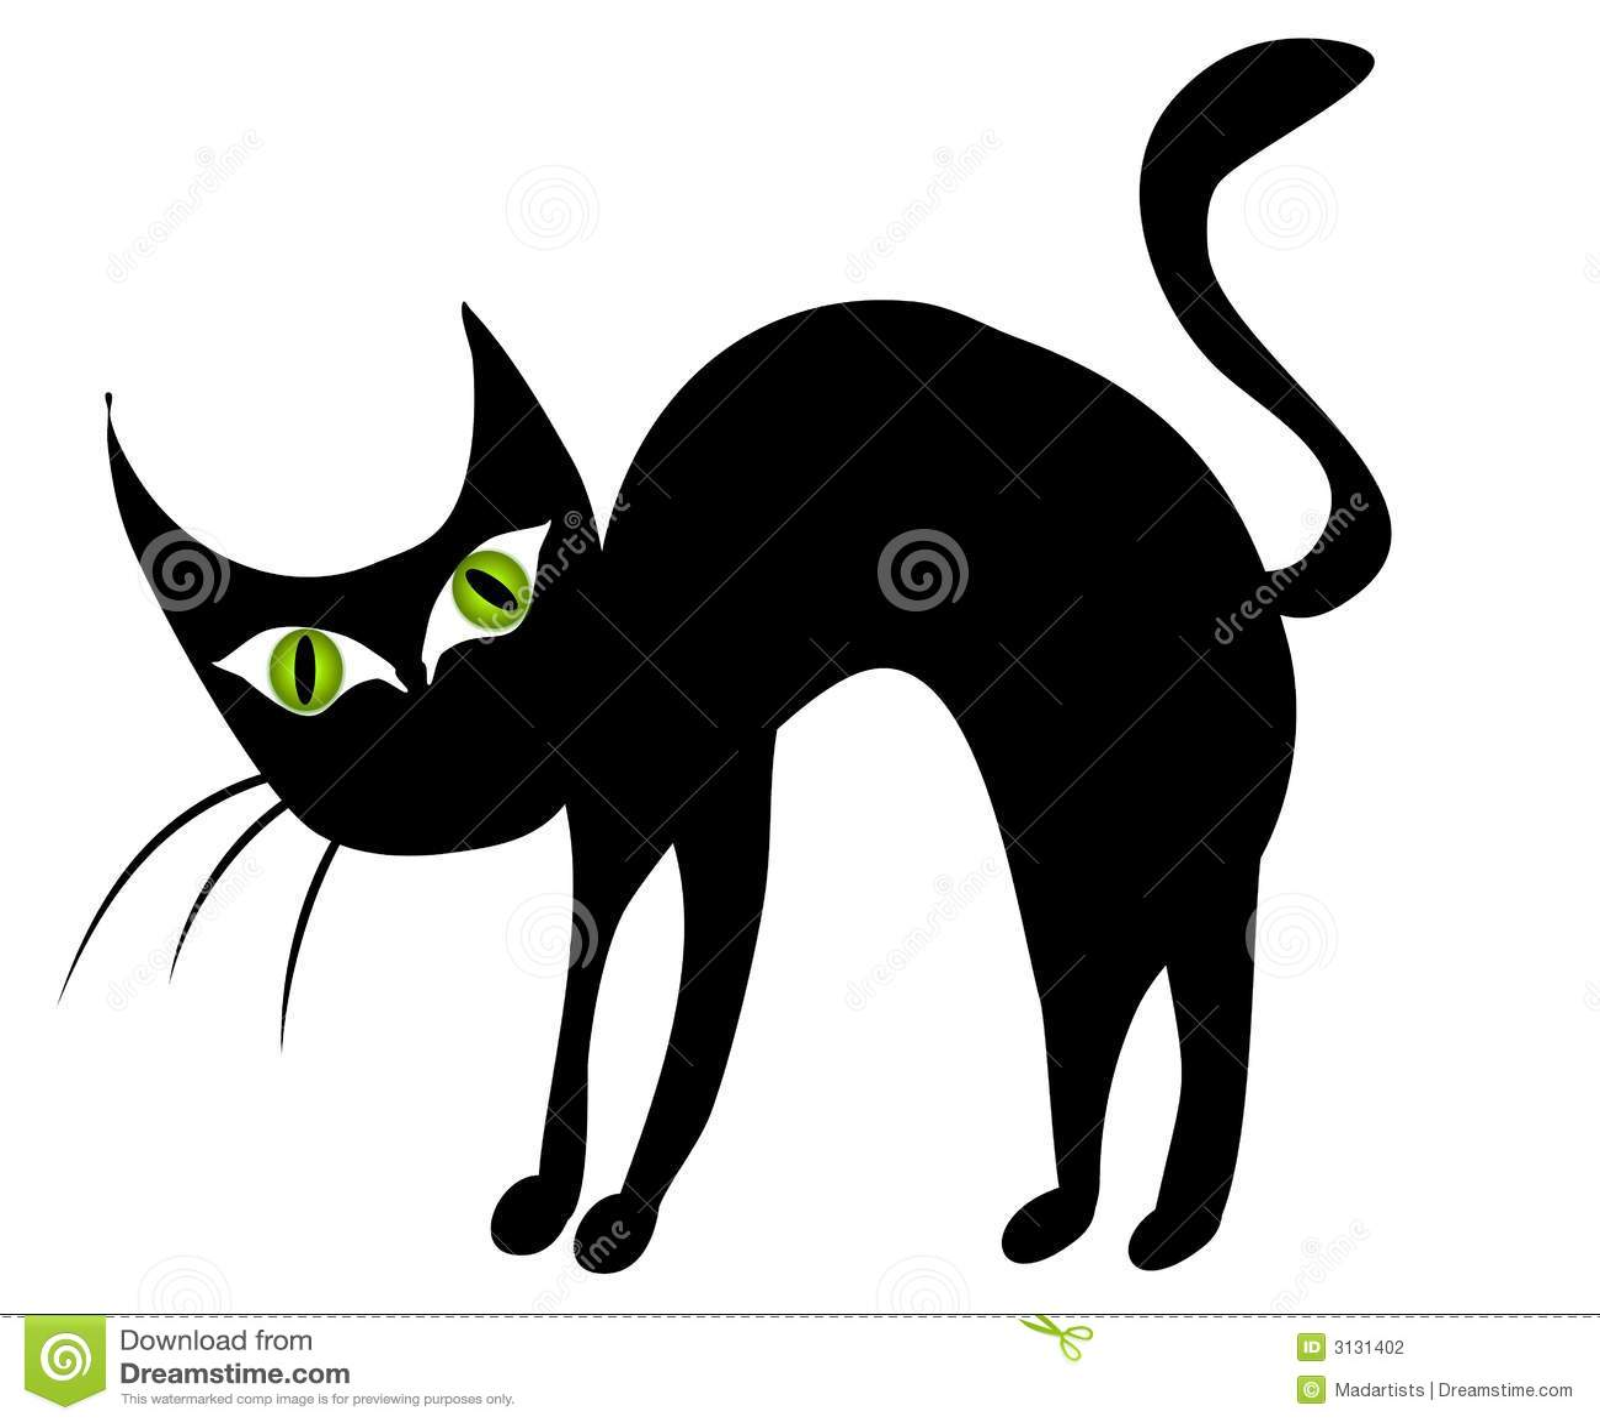 isolated black cat clip art 2 stock illustration image. Black Bedroom Furniture Sets. Home Design Ideas